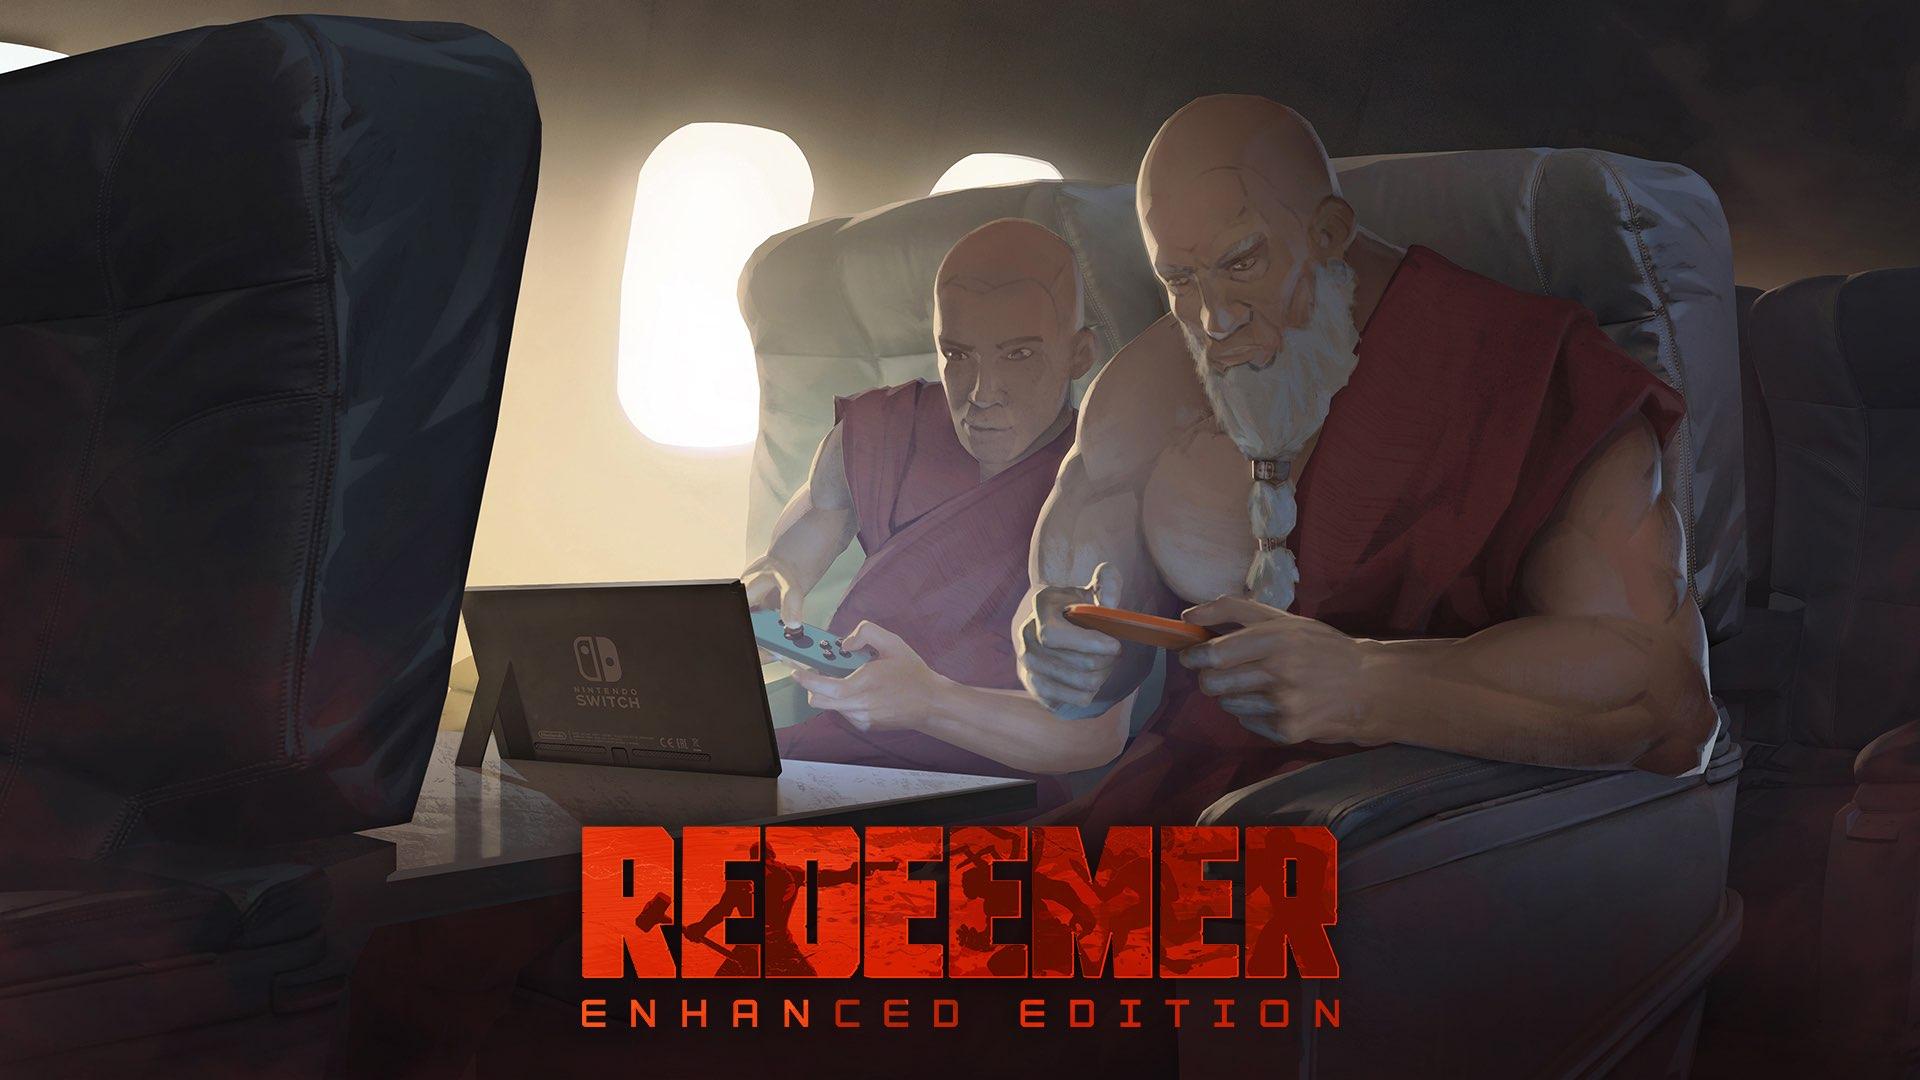 Redeemer: Enhanced Edition Decimates Switch Next Month